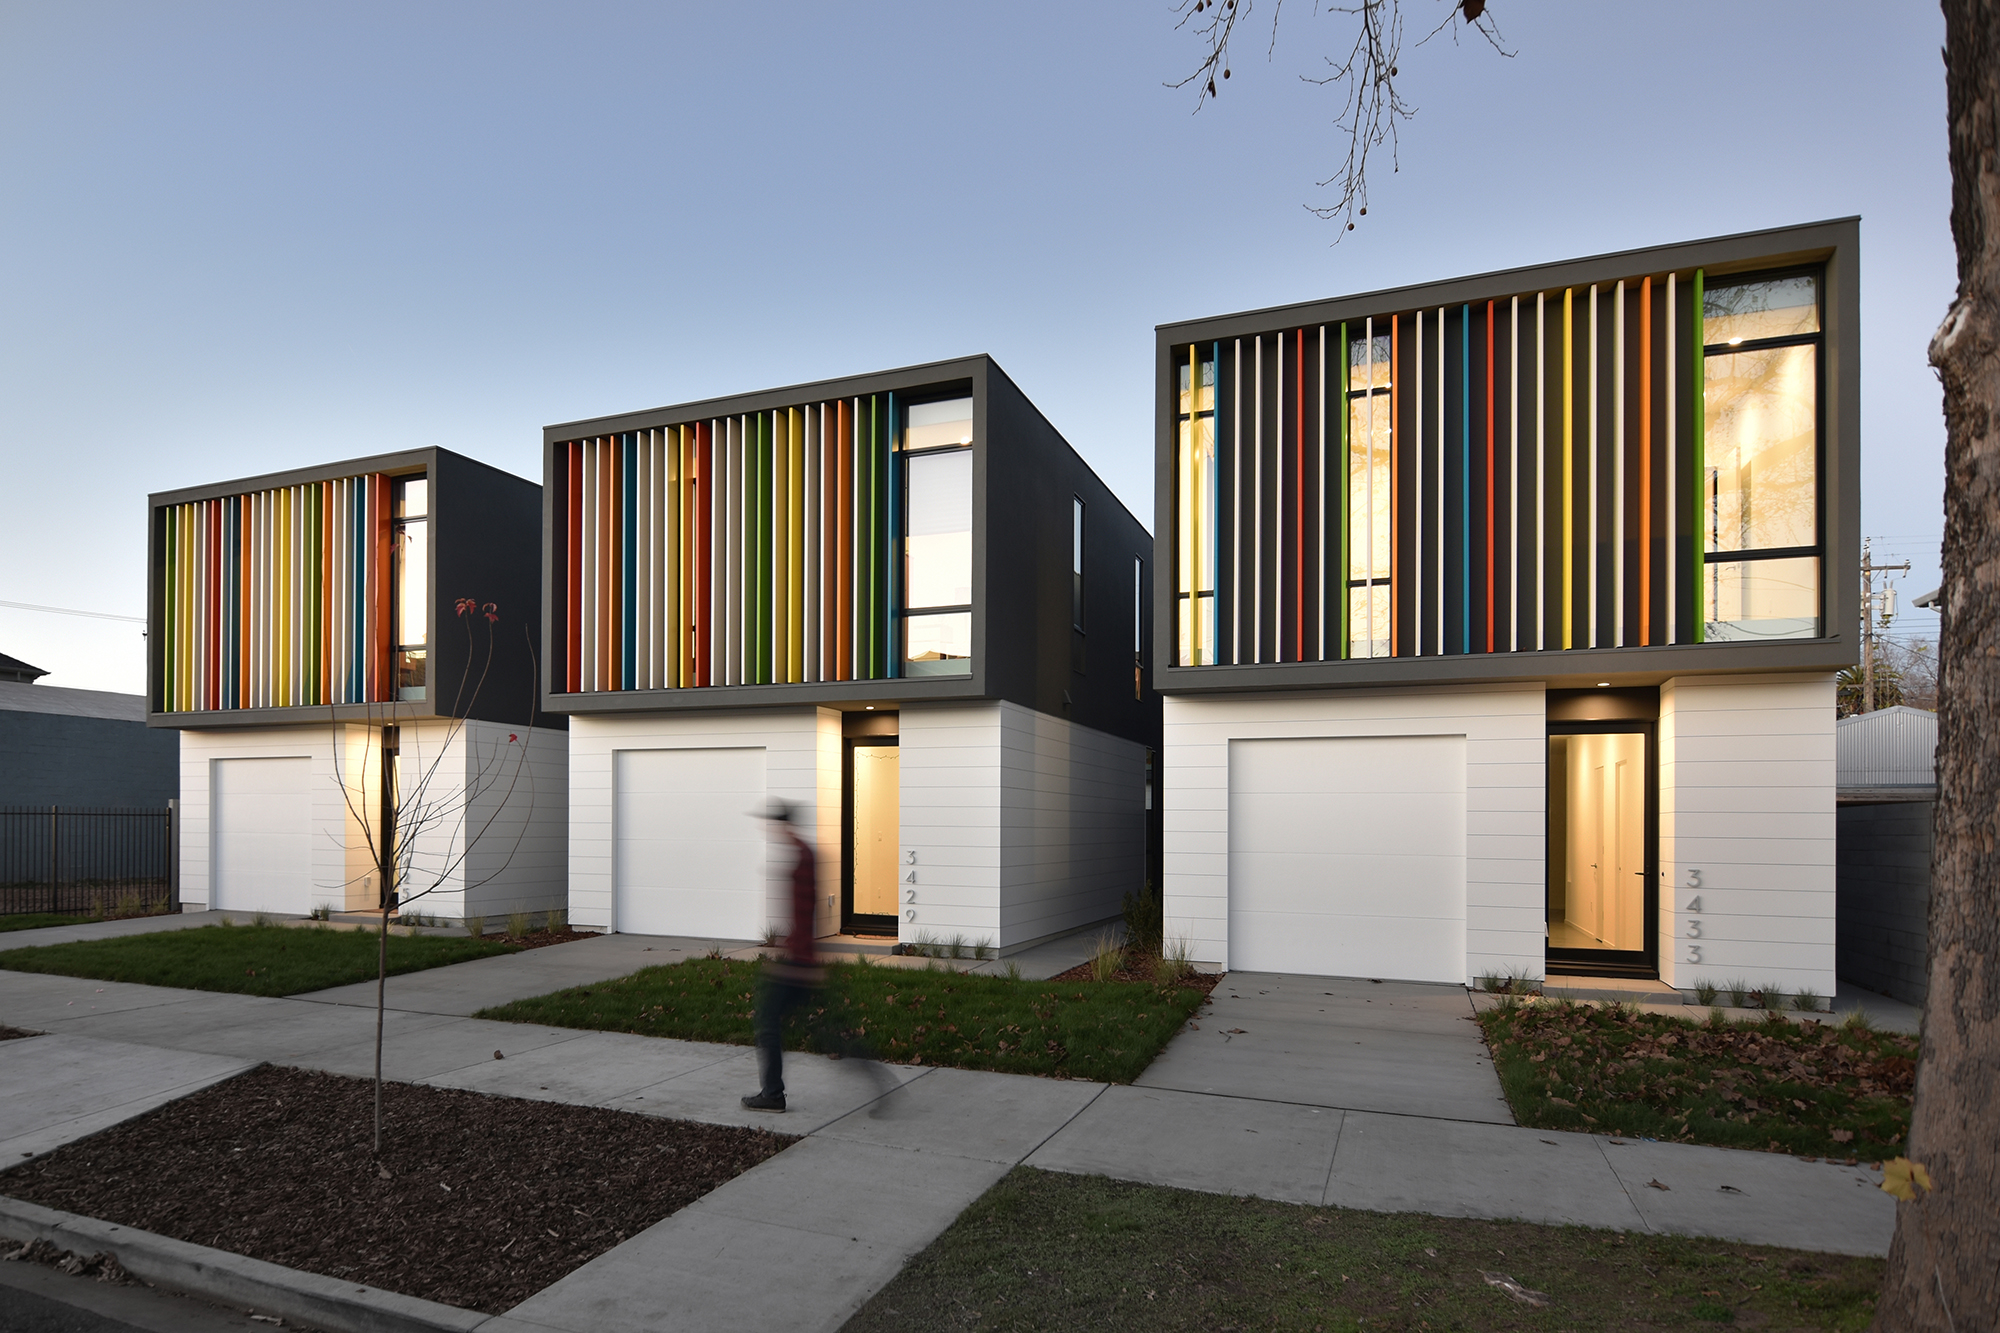 Oak Park Housing By Johnsen Schmaling Architects